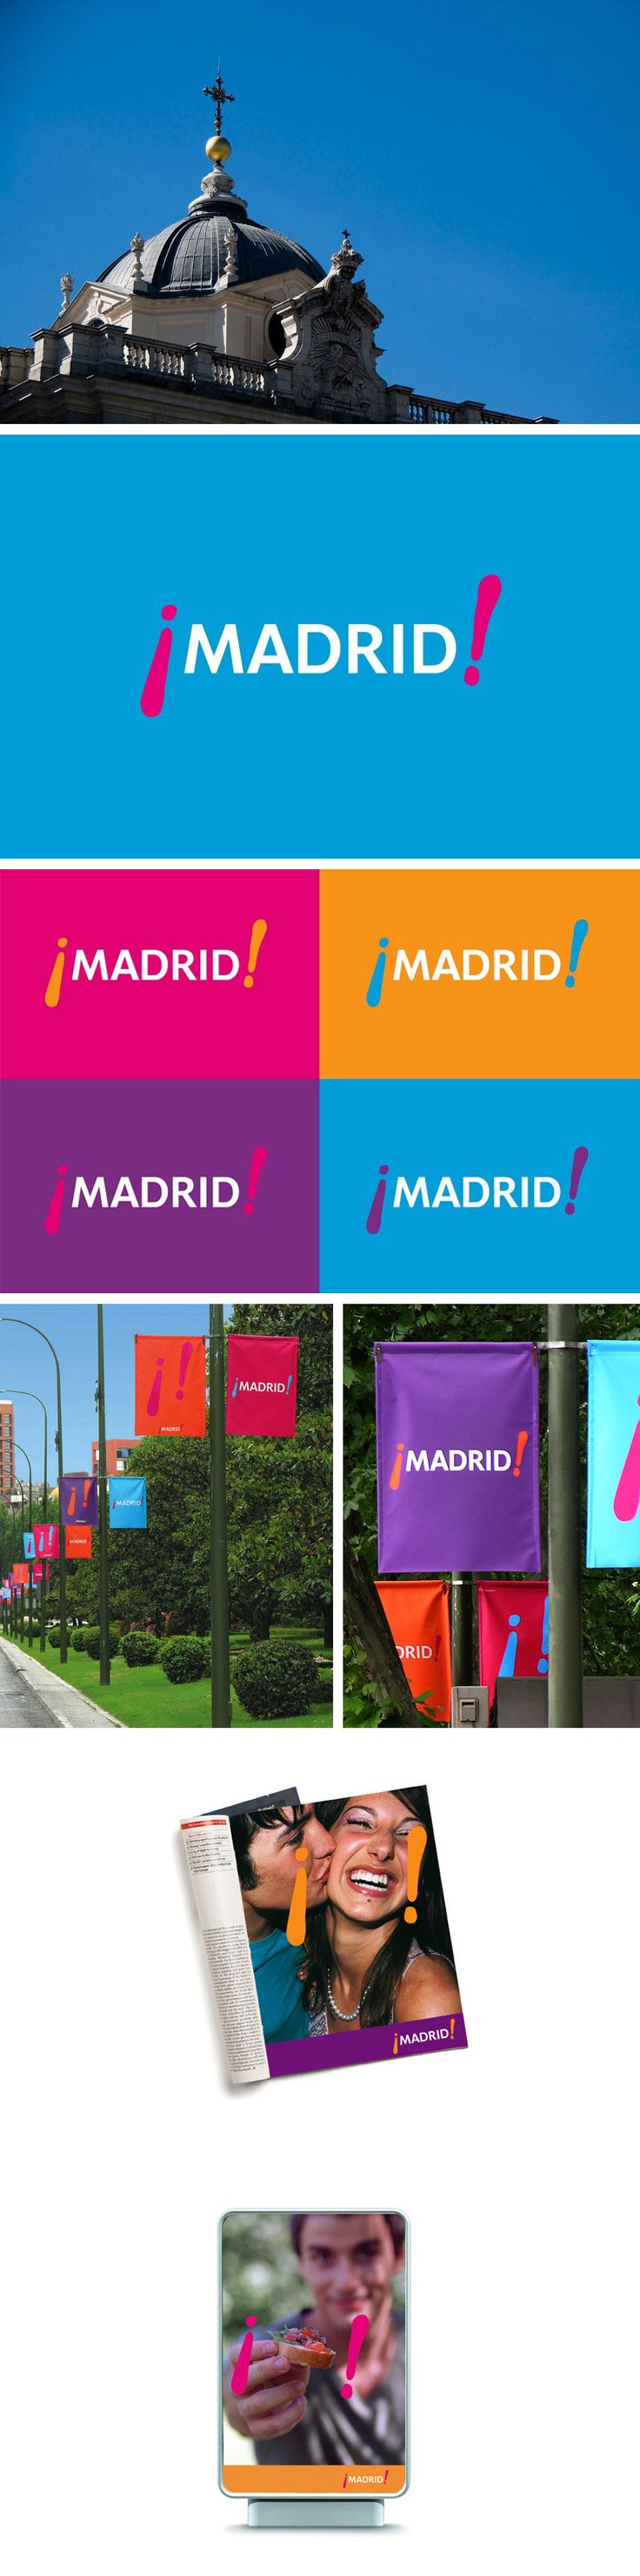 Branding Madrid, Spain, by Landor #city_brand 2012